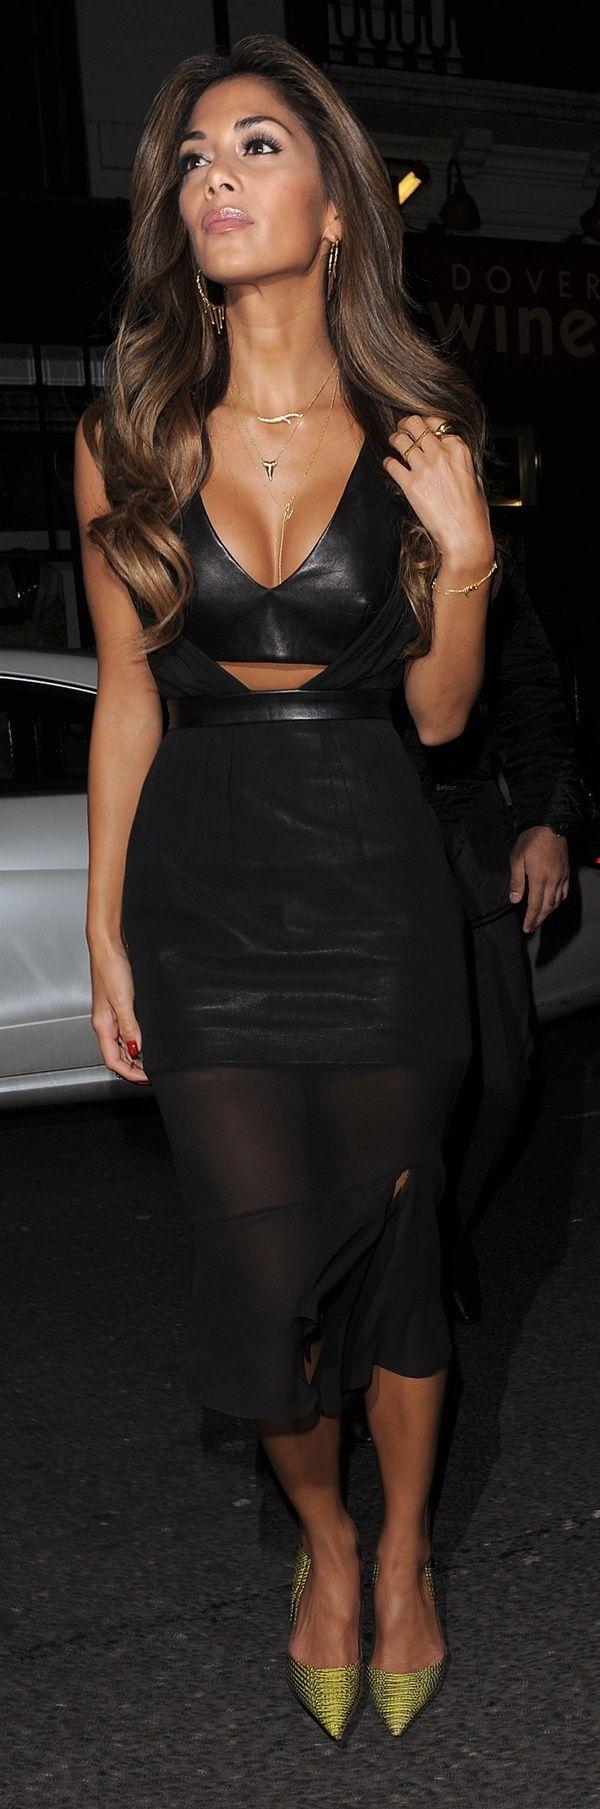 Nicole Scherzinger Can't Get Enough of Her Pin-Heel Pumps